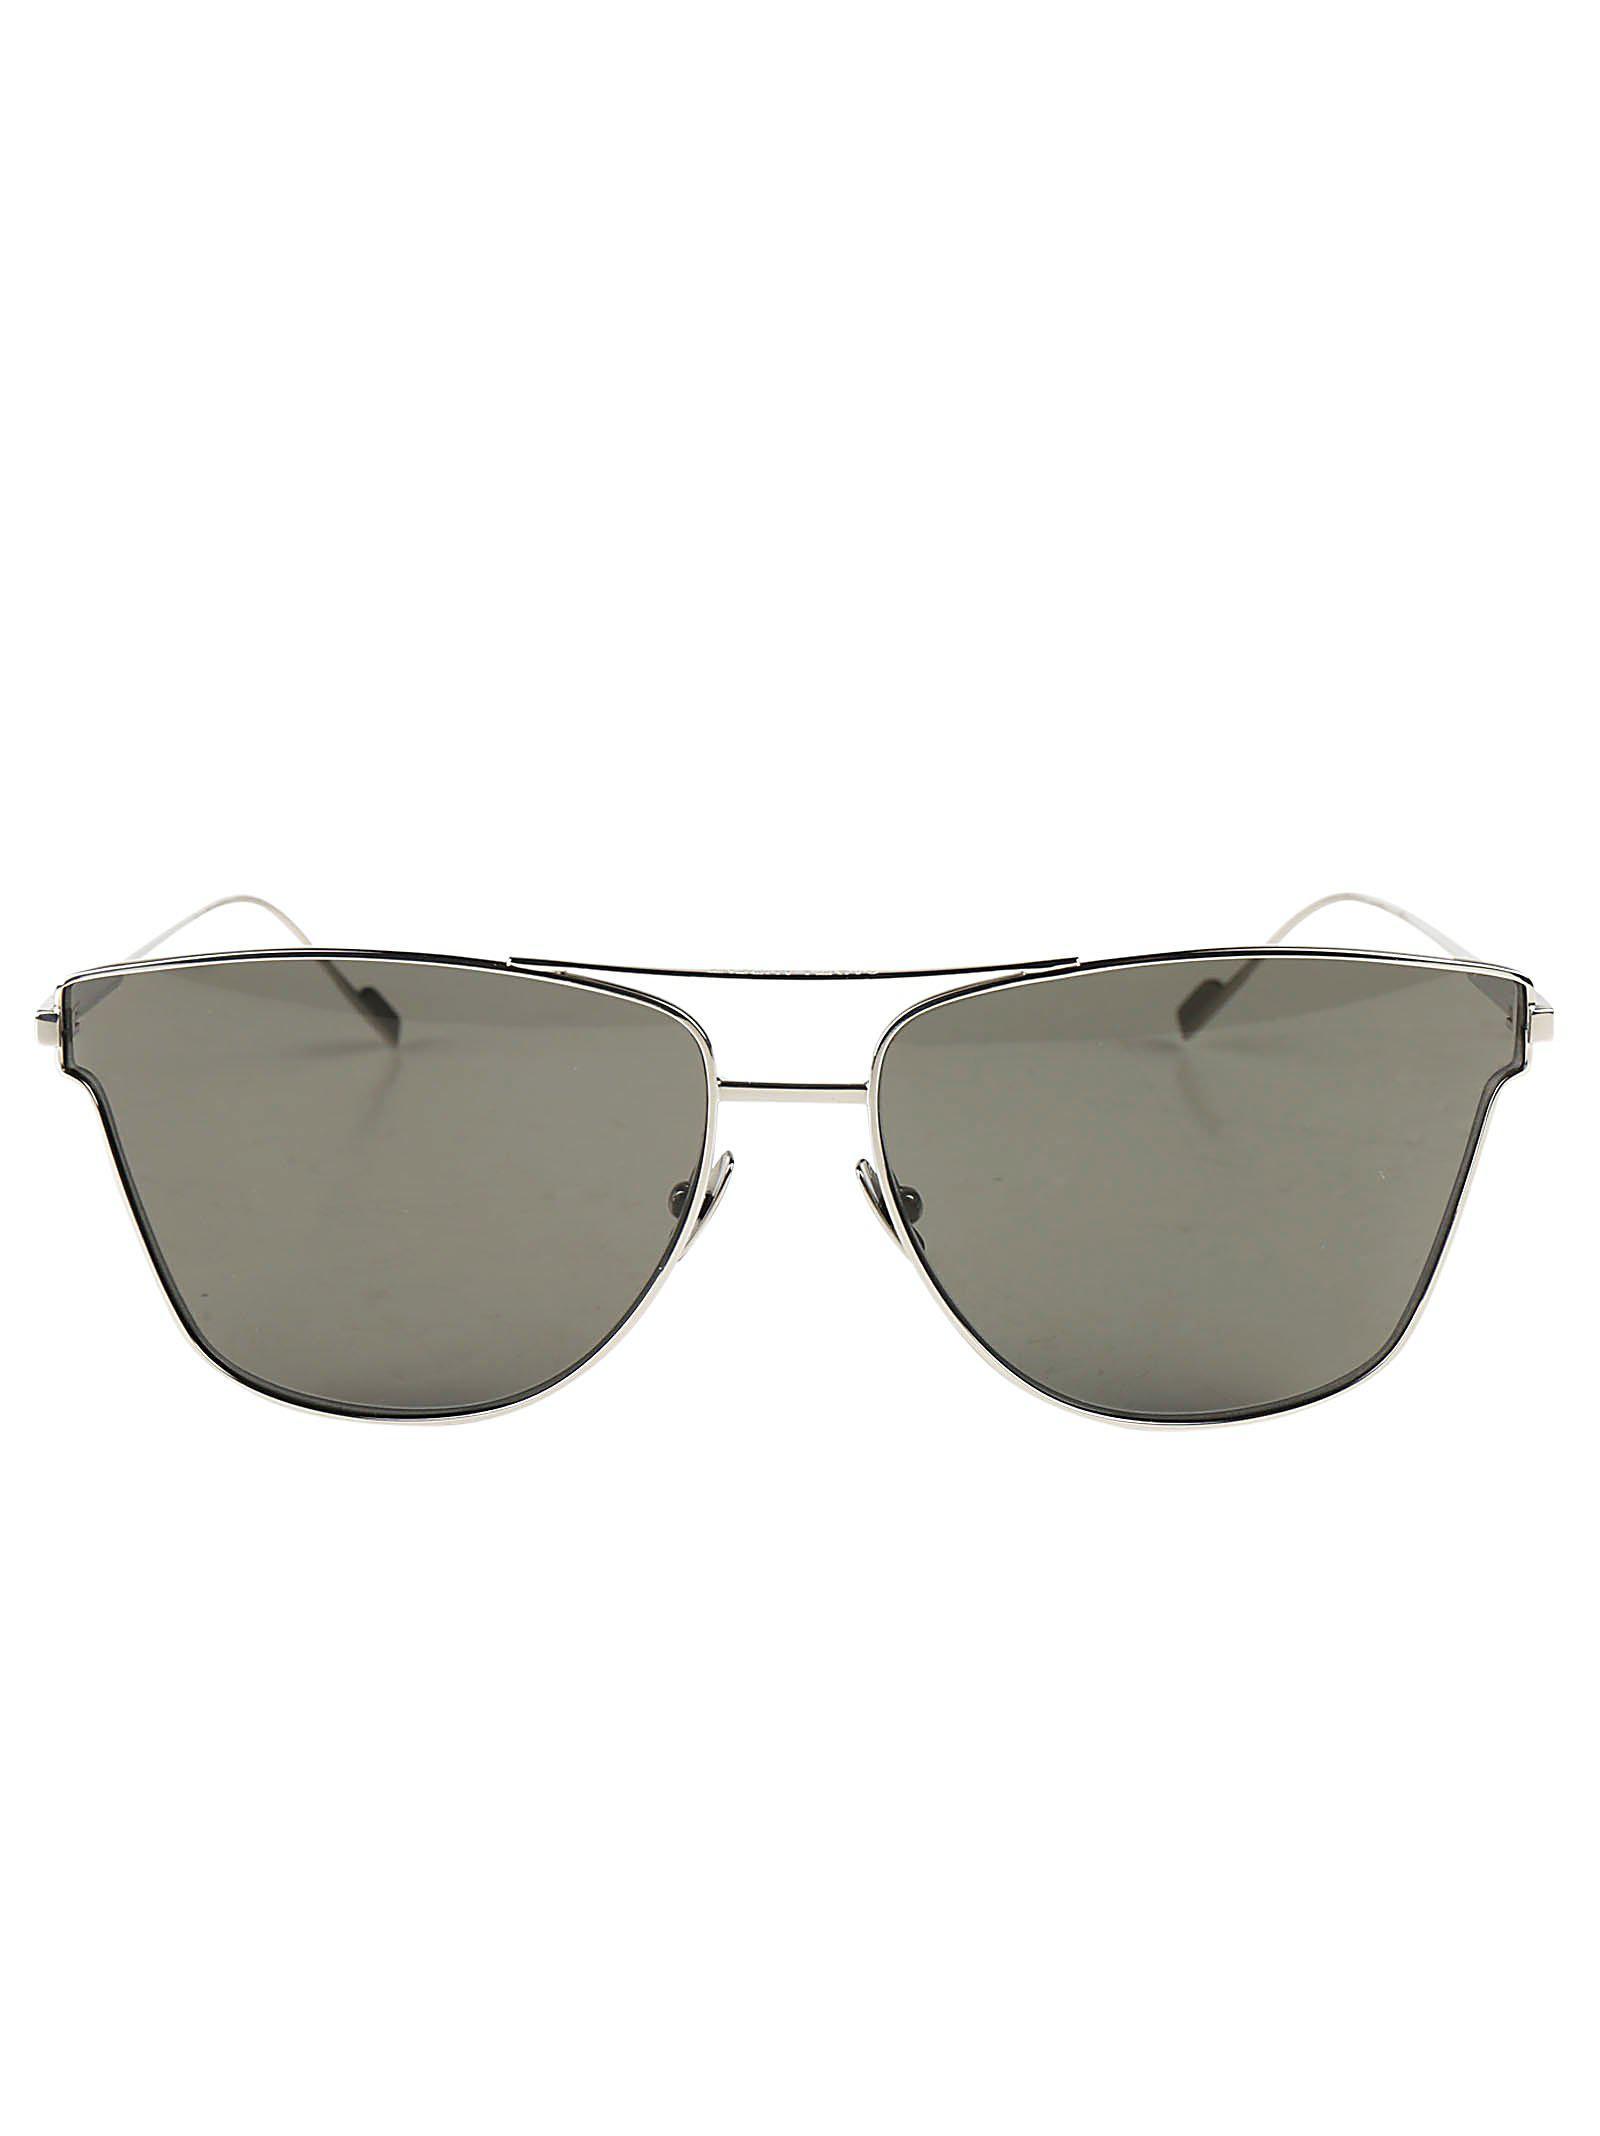 bc388076a8 Saint Laurent Cat Eye Sunglasses in Green for Men - Lyst